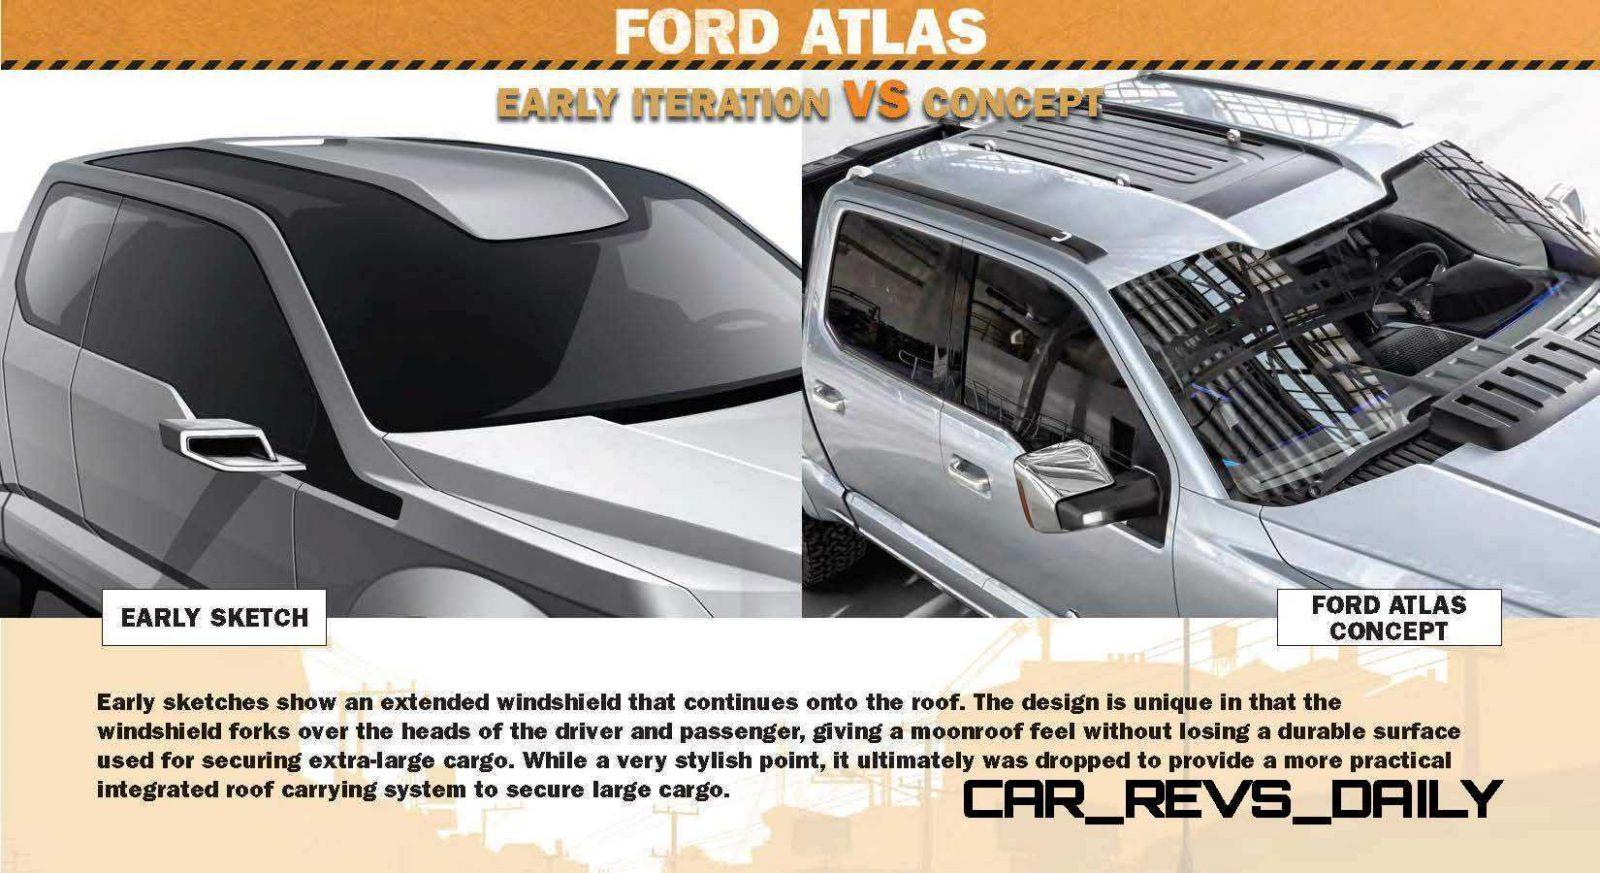 Ford Atlas Concept: Slide 2